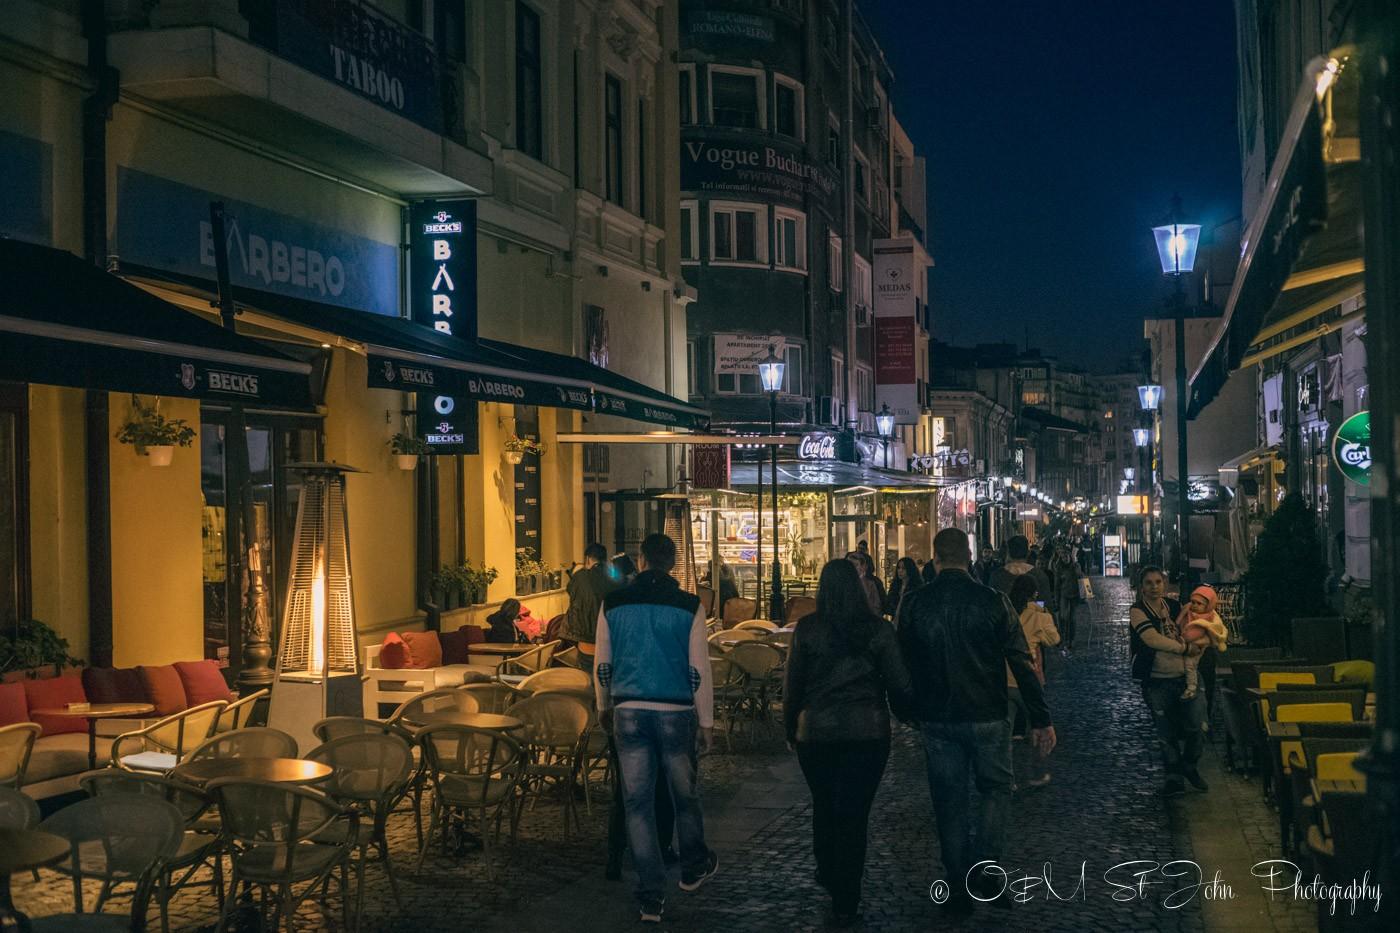 Old Town, Bucharest. Romania